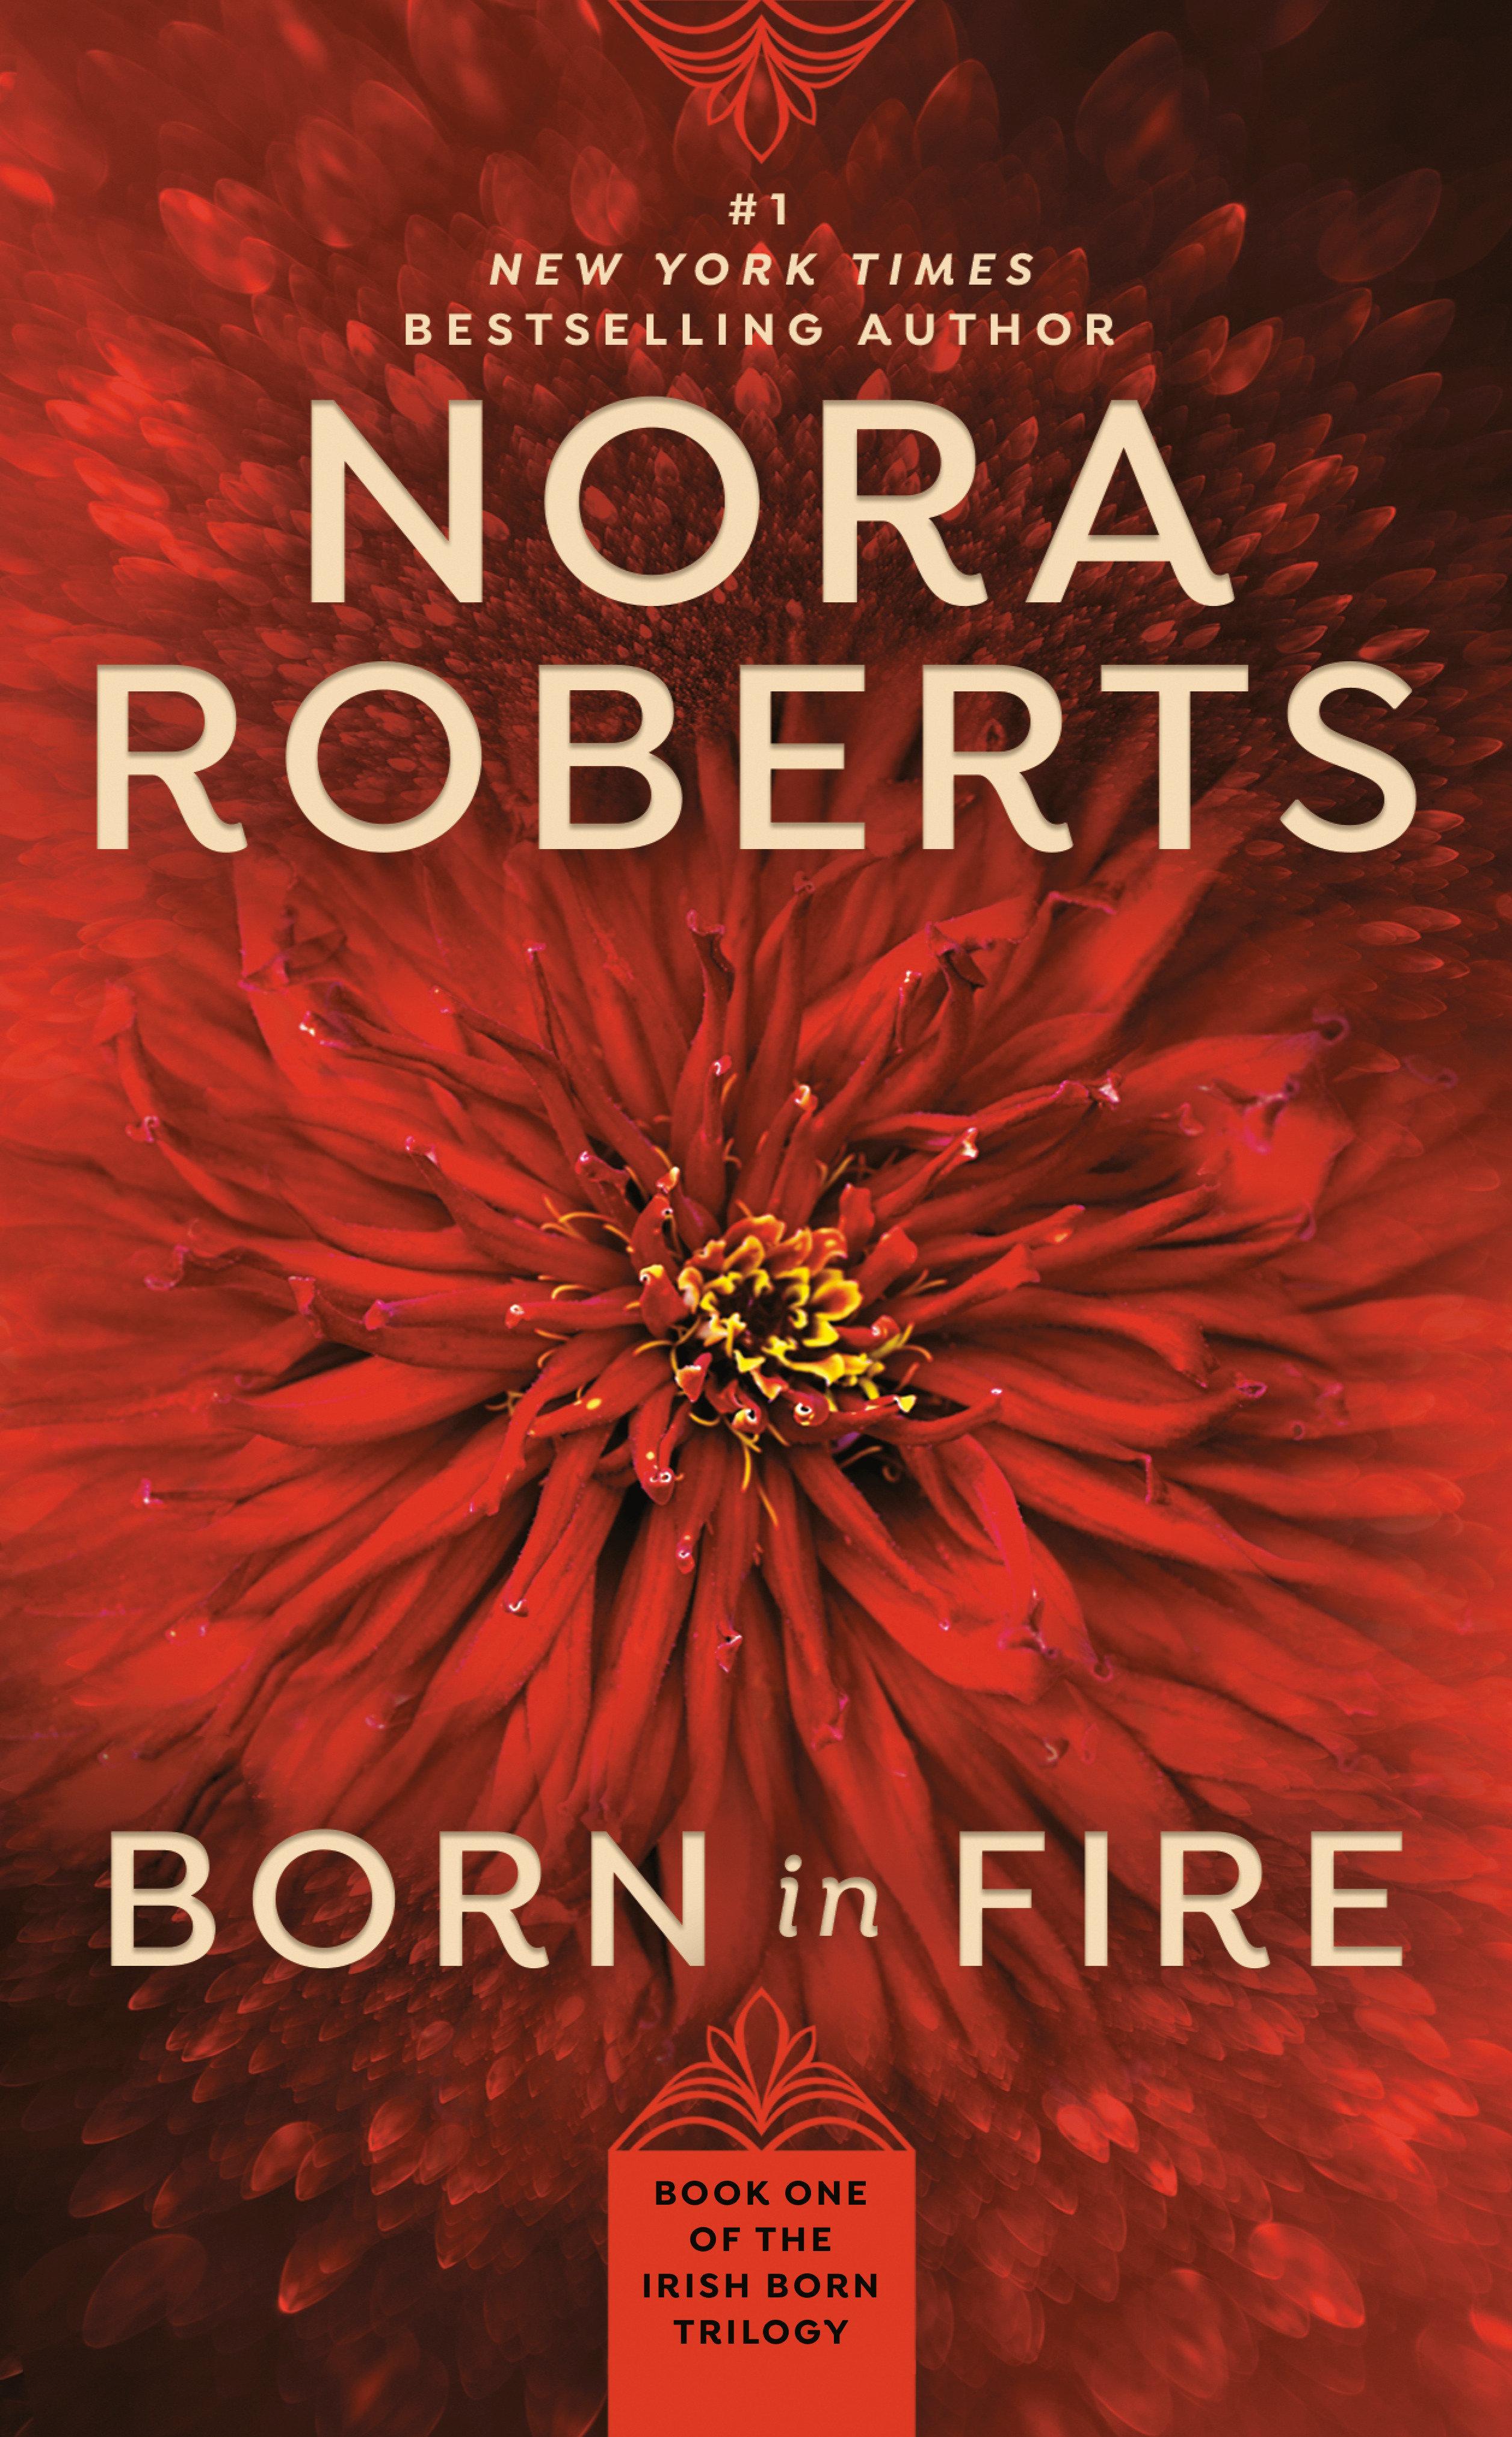 Born in fire cover image